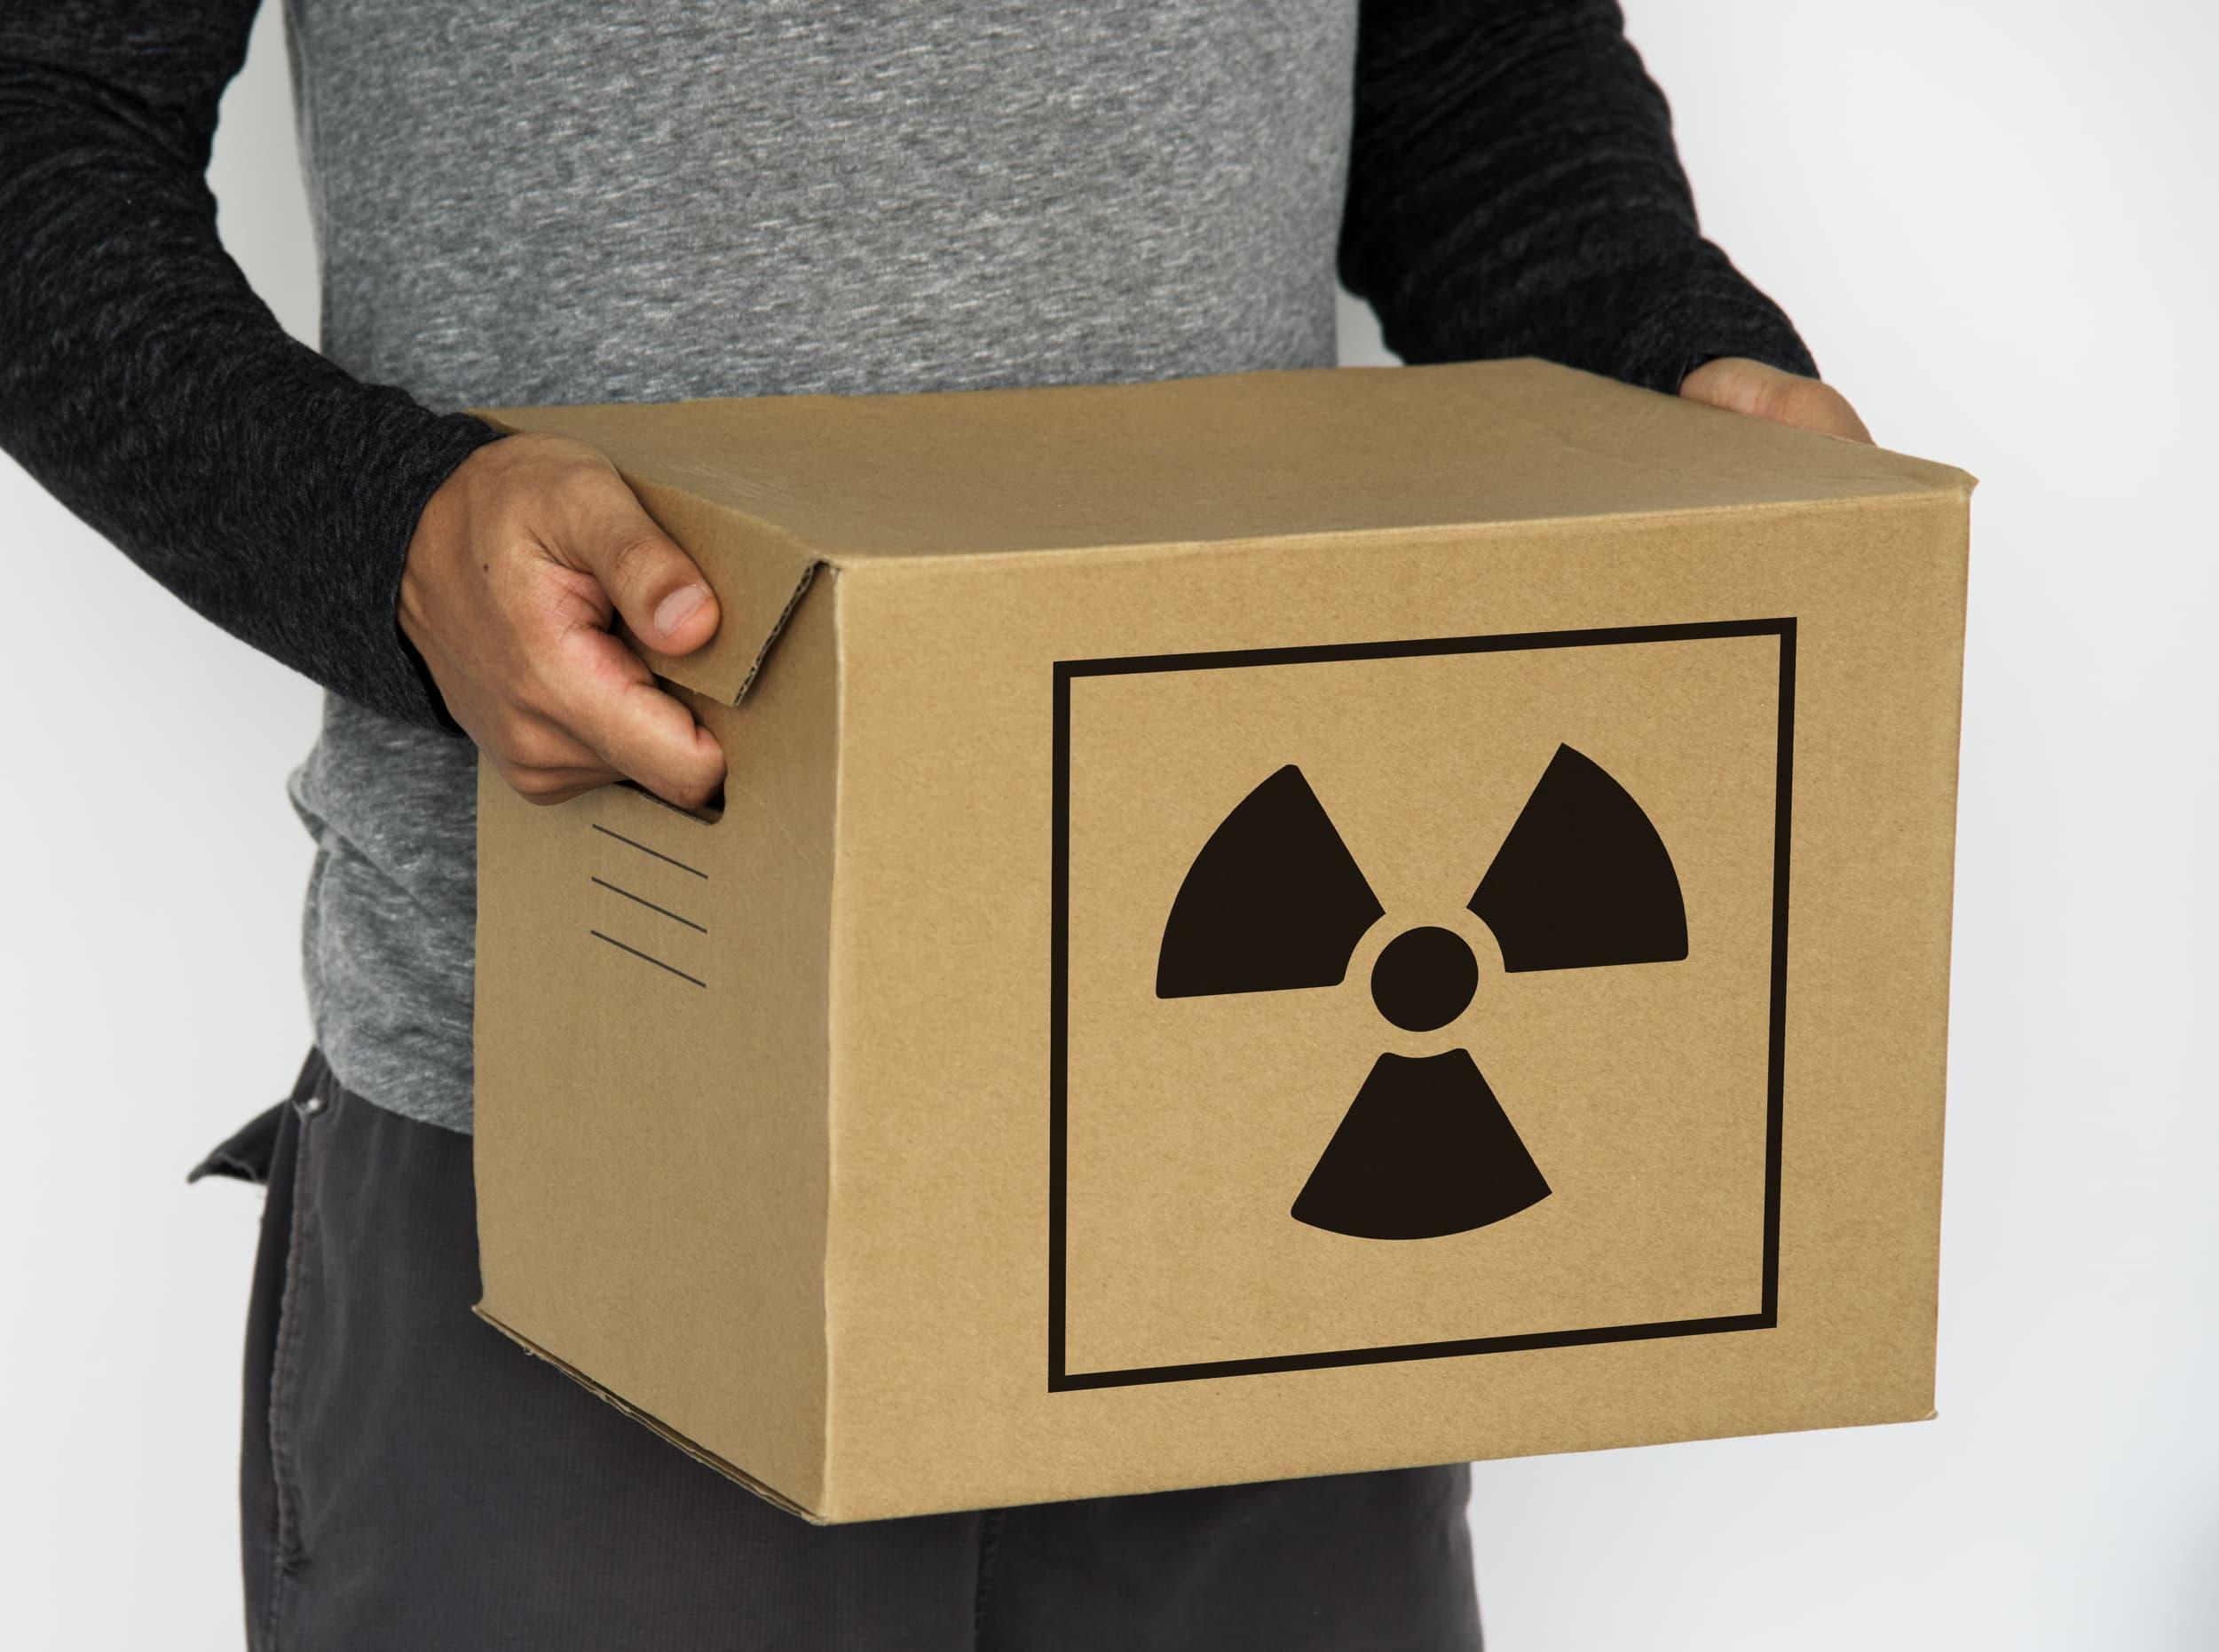 Compliance Training Online IATA DGR Class 7 Radioactive Materials course